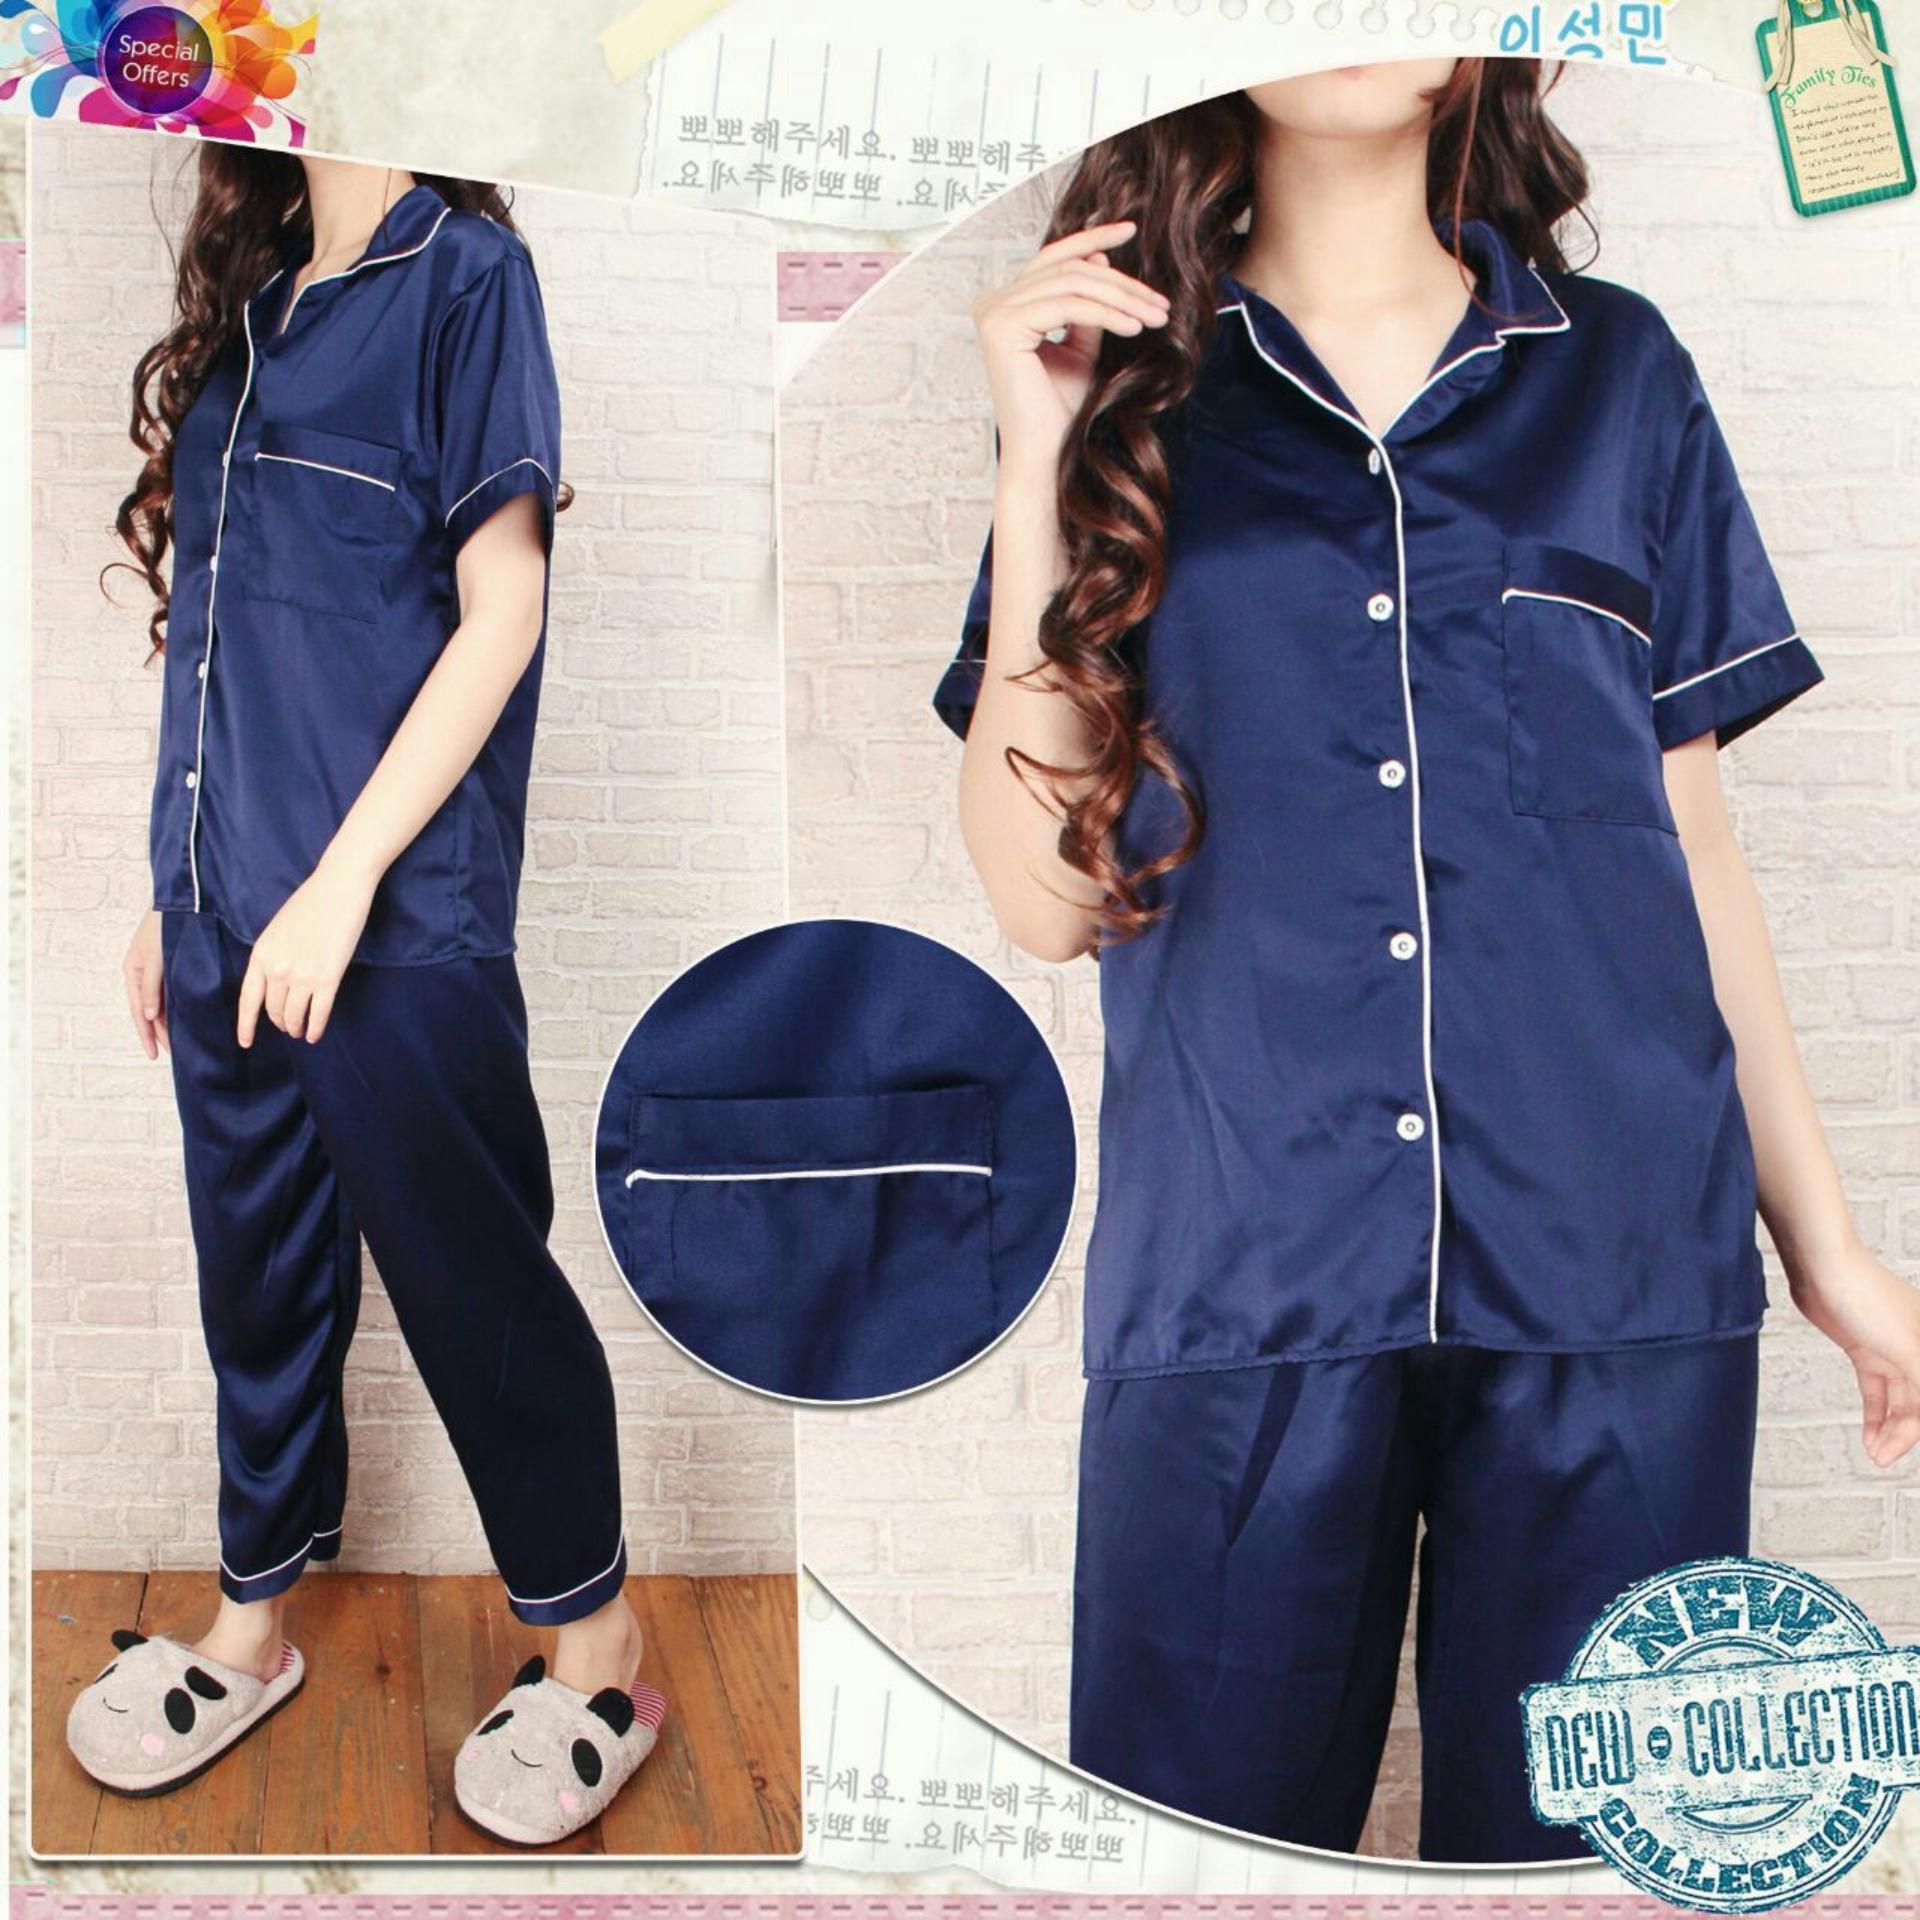 Baju Tidur Wanita Fashionable - Baju Santai Wanita - Pajamas Satin Panjang